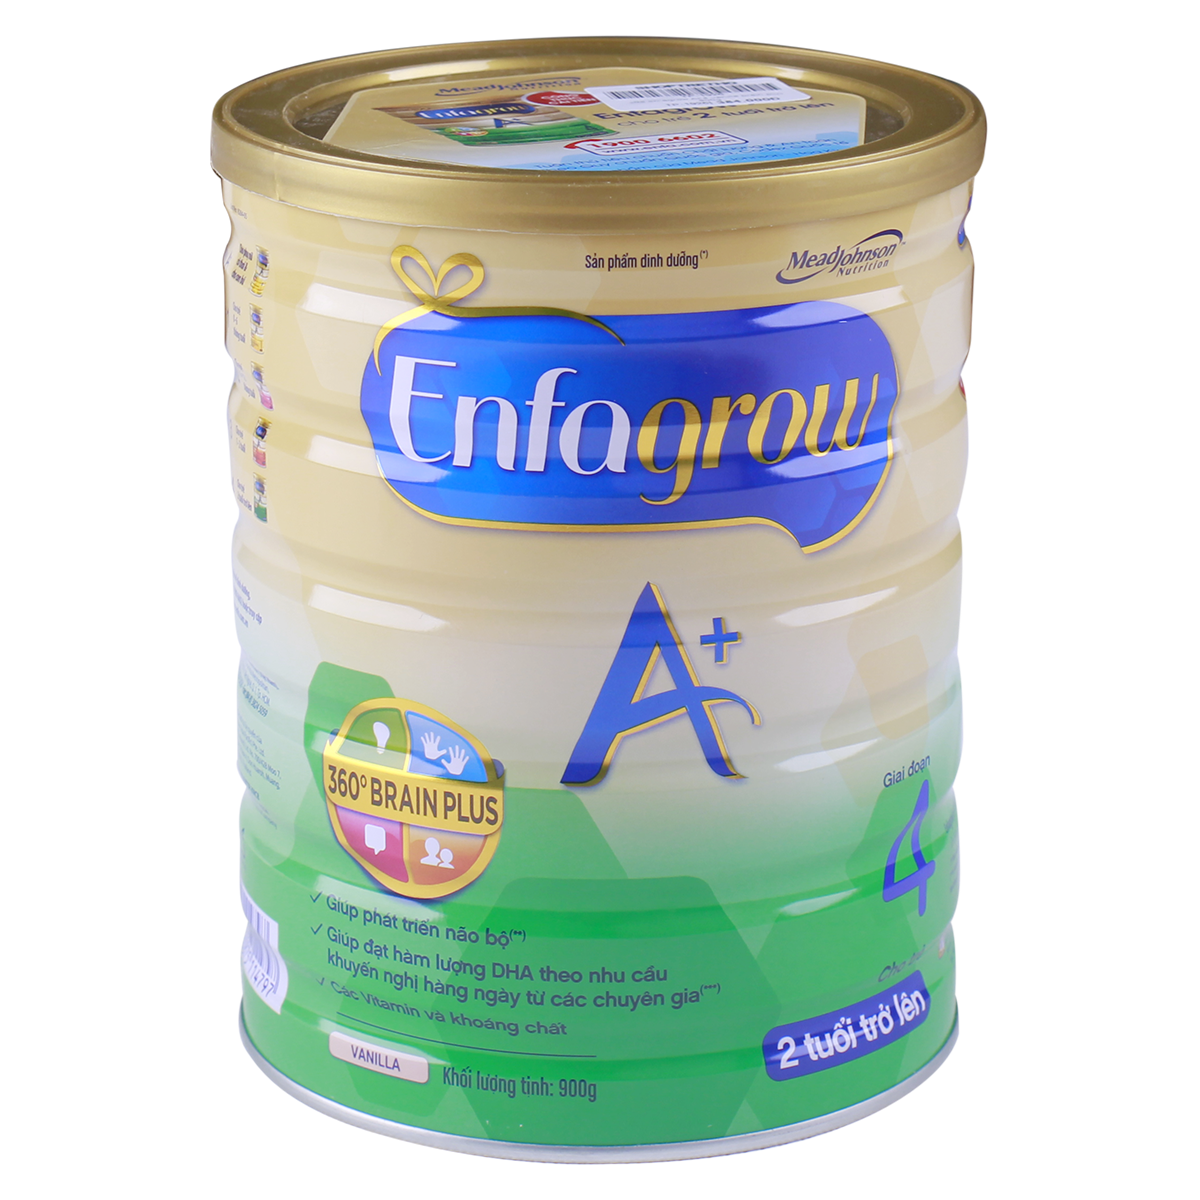 Sữa Enfagrow A+ 4 vanilla 360 Brain Plus (900g)